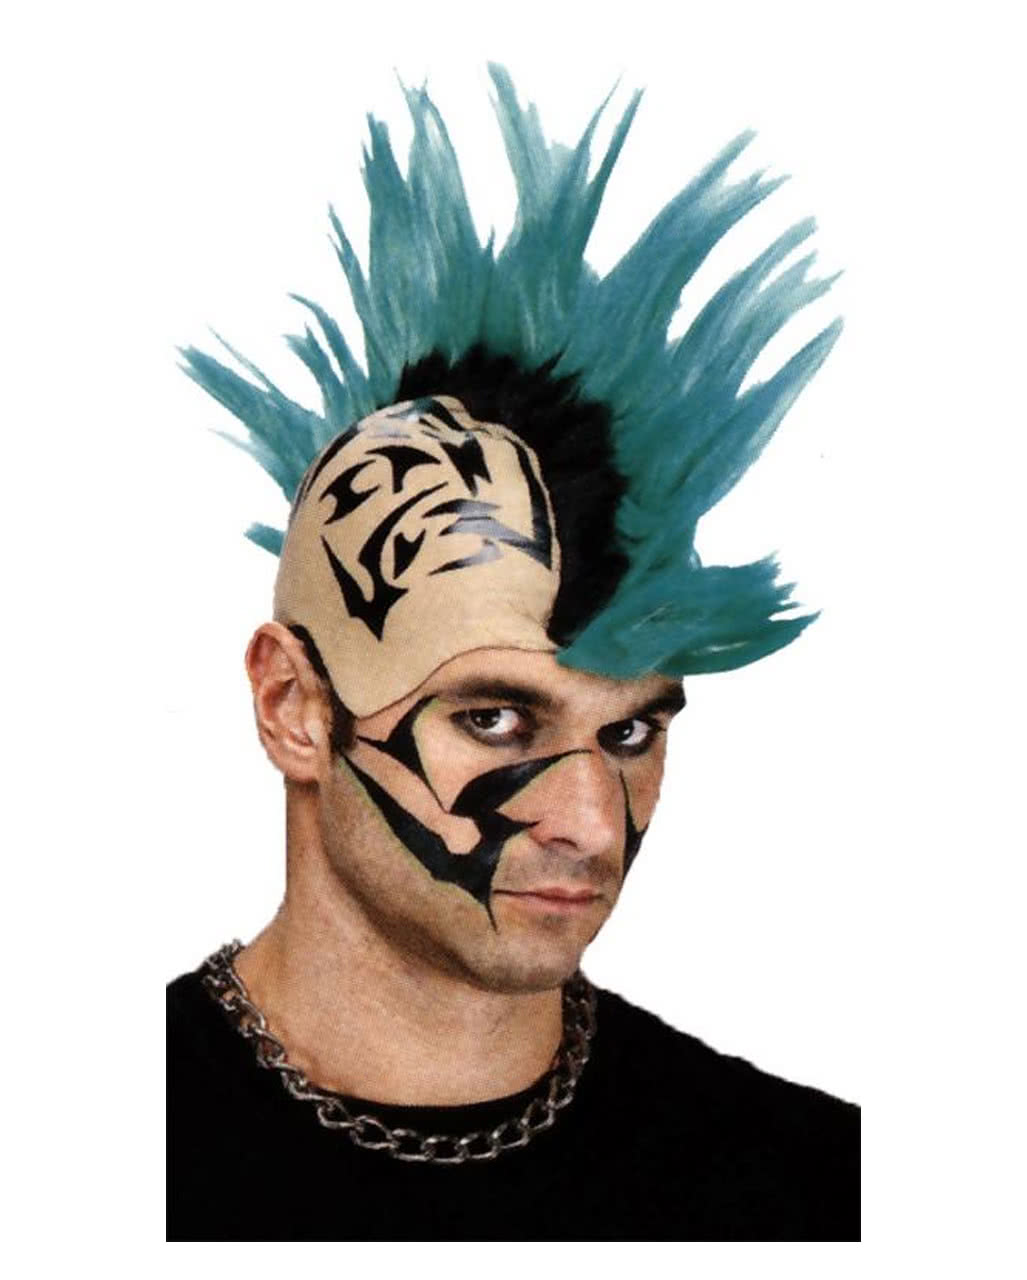 Mohawk Punk Perucke Grun Als Faschingsperucke Karneval Universe